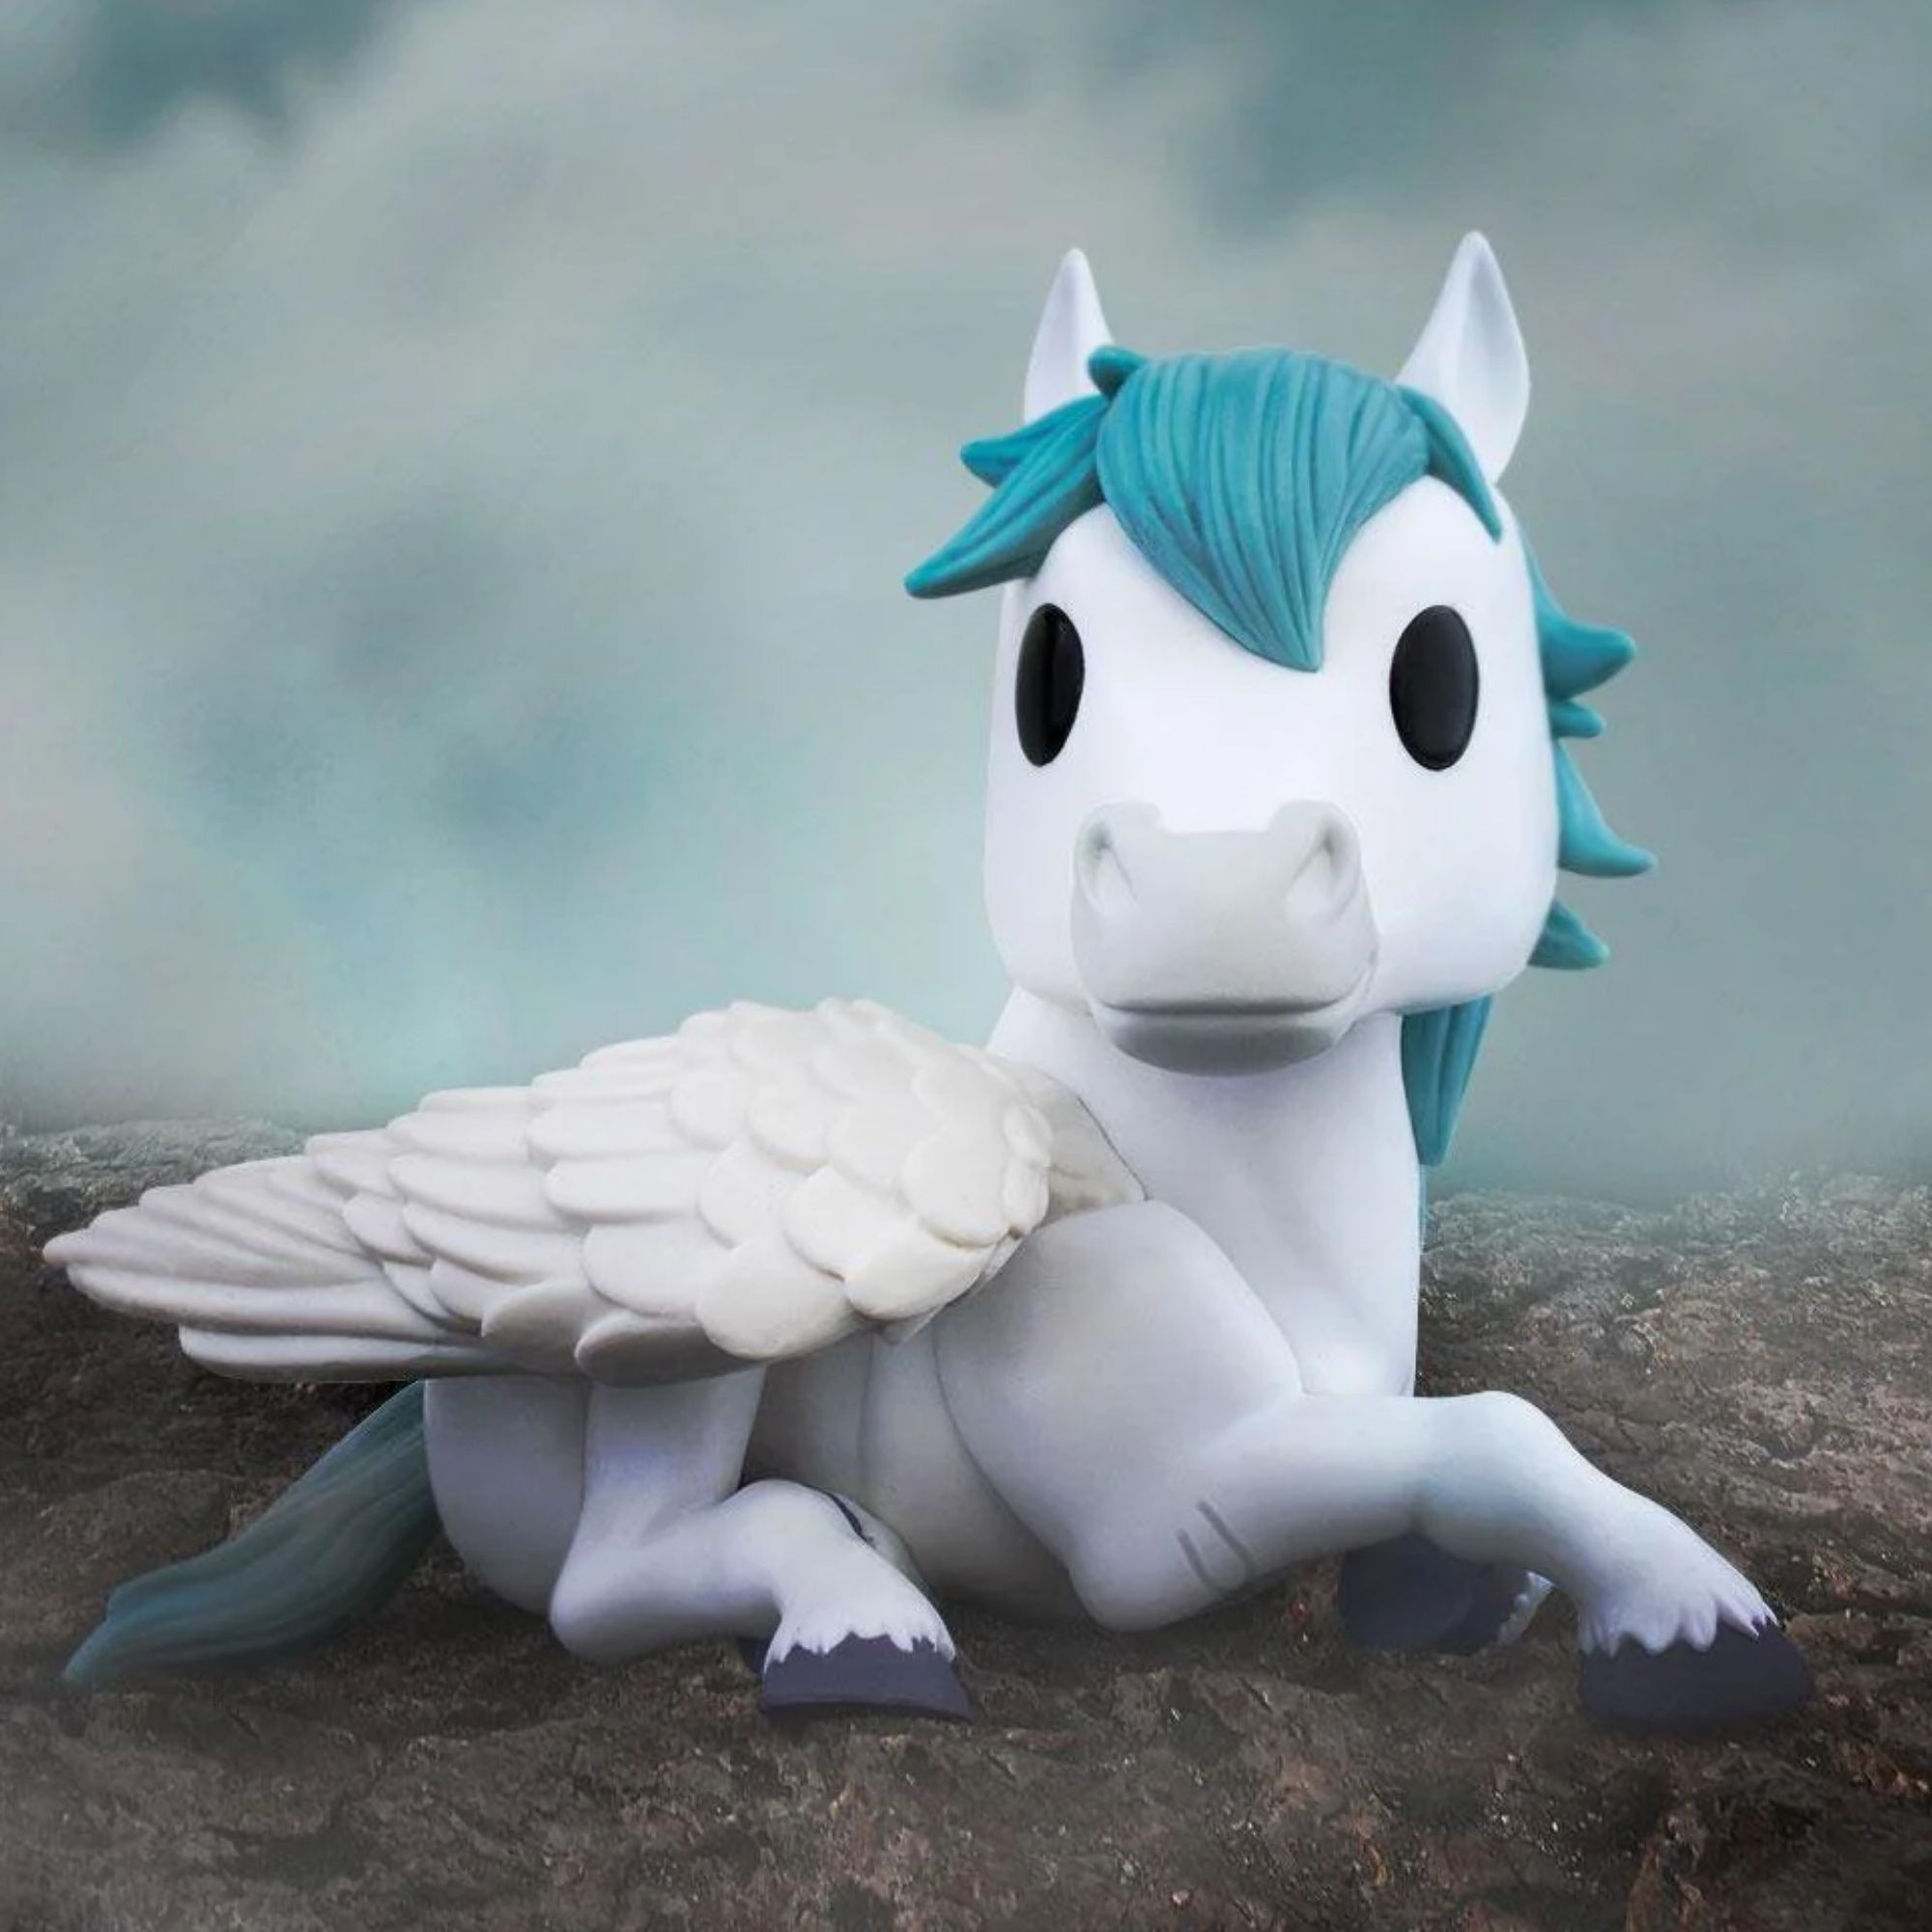 Funko Pop Myths Pegasus Exclusivo Funko Shop #26  - Game Land Brinquedos